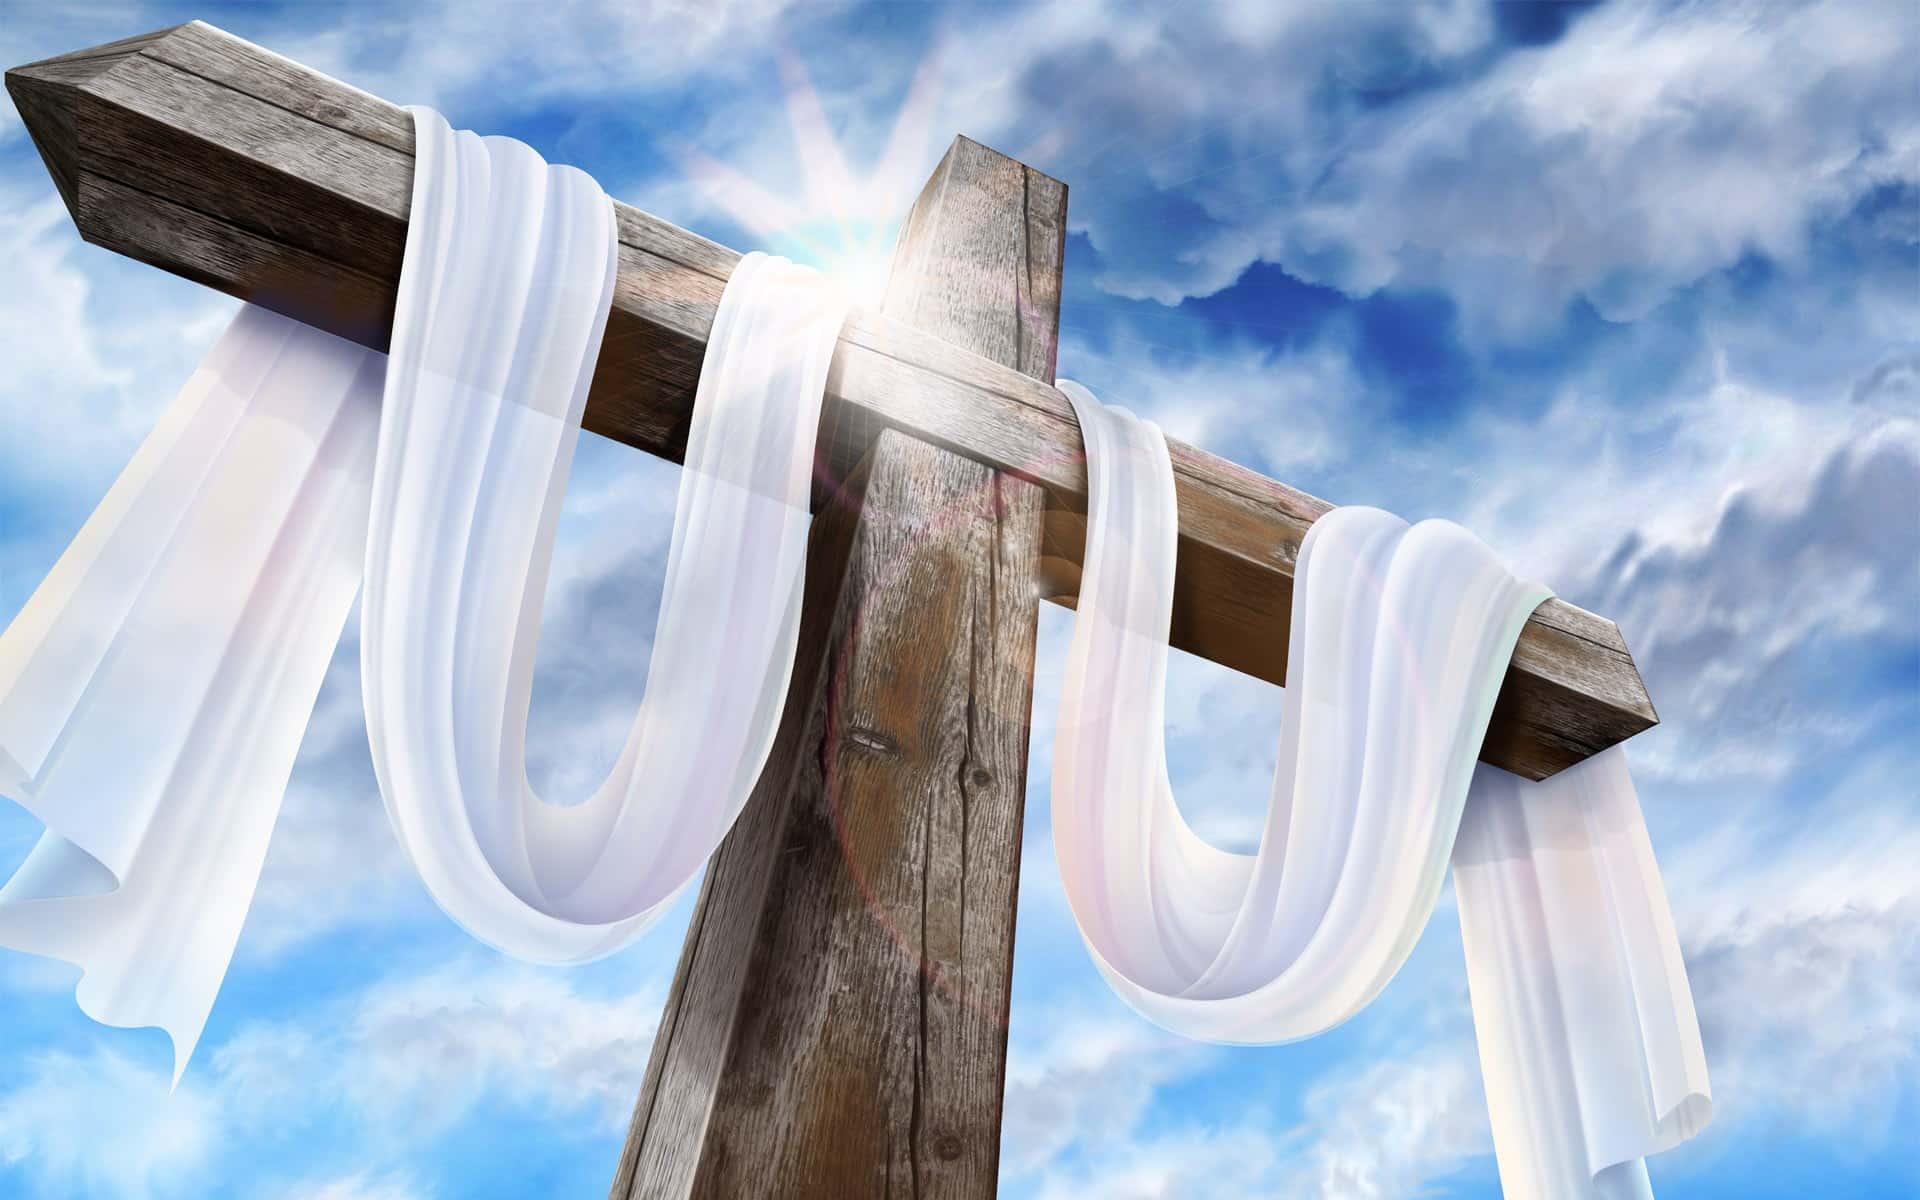 http://www.turnbacktogod.com/wp-content/uploads/2011/04/Easter-Wallpaper-Background-02.jpg